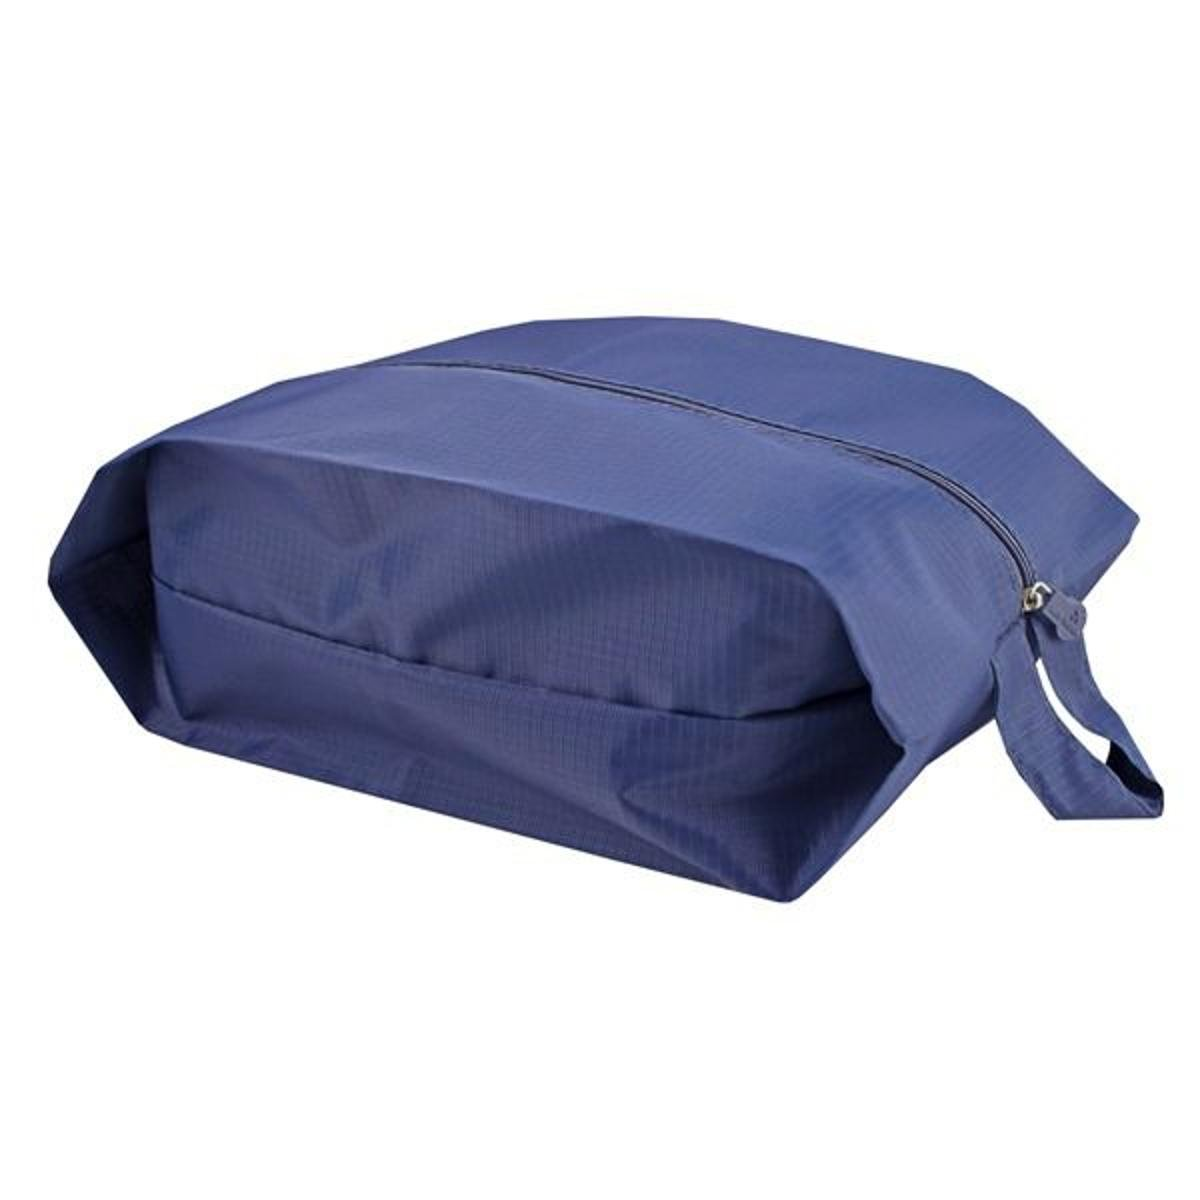 Bolsa Porta Sapato Jacki Design Viagem - Azul Escuro - Compre Agora ... a1fdcbc9eacc0